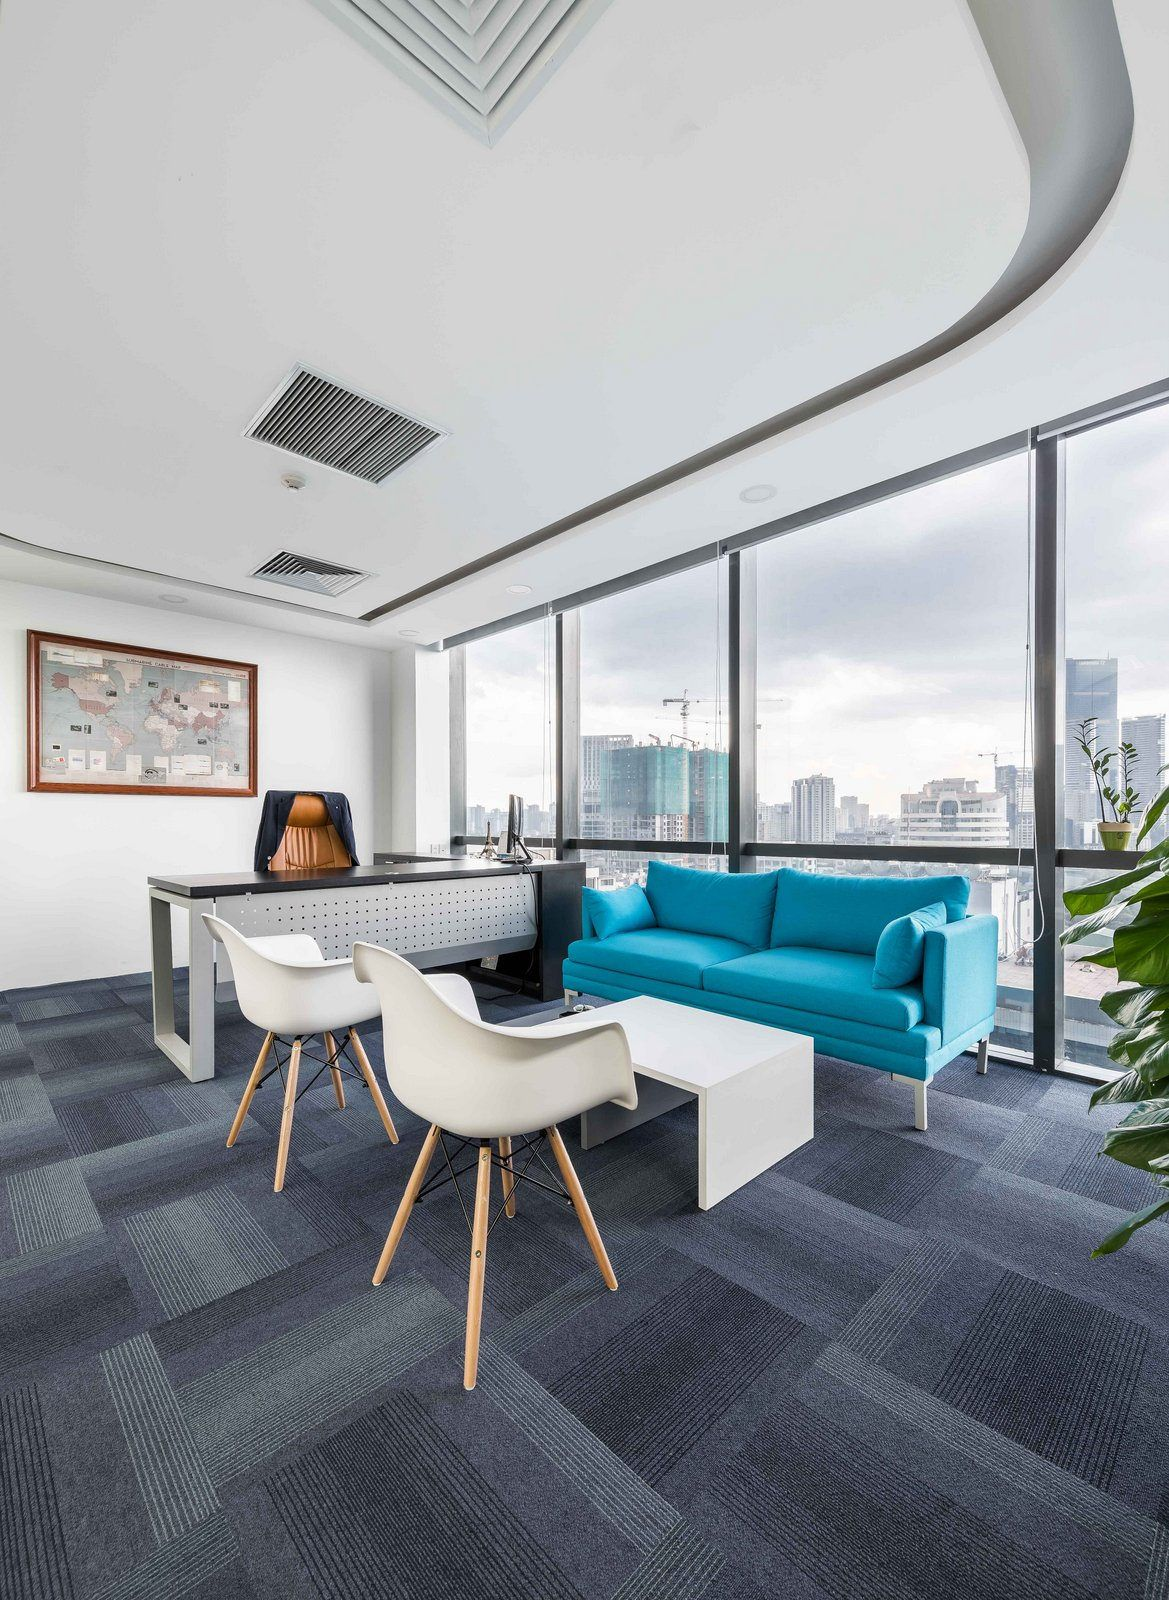 Telecommunication Room Design: Office Tour: CMC Telecom Offices – Hanoi